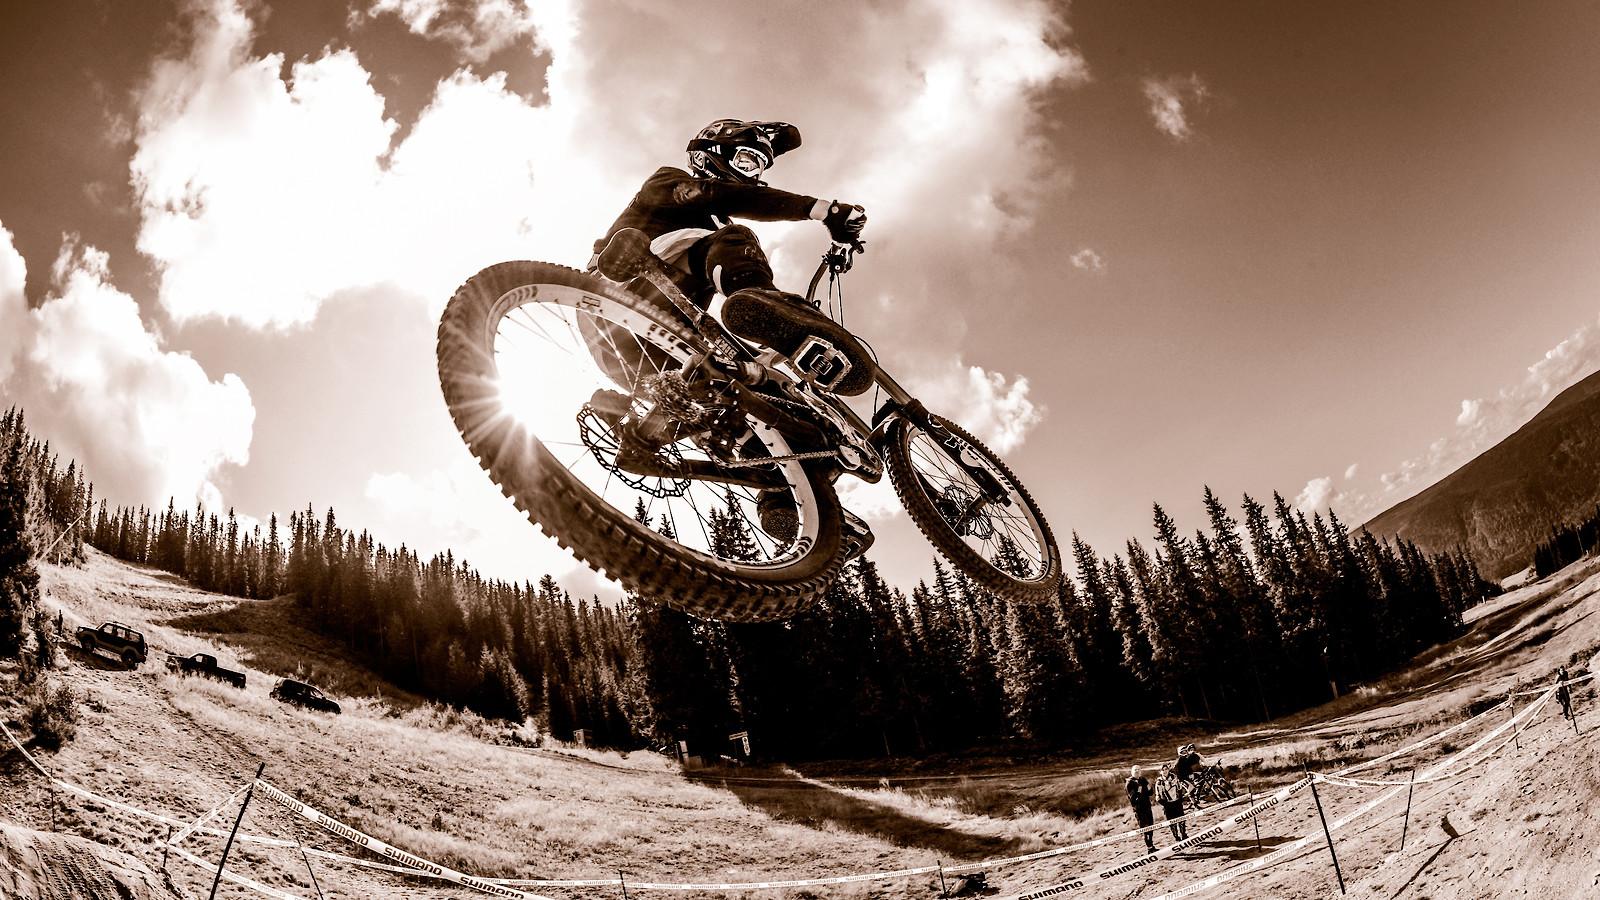 9813171683 cbf875cd93 o - phunkt.com - Mountain Biking Pictures - Vital MTB